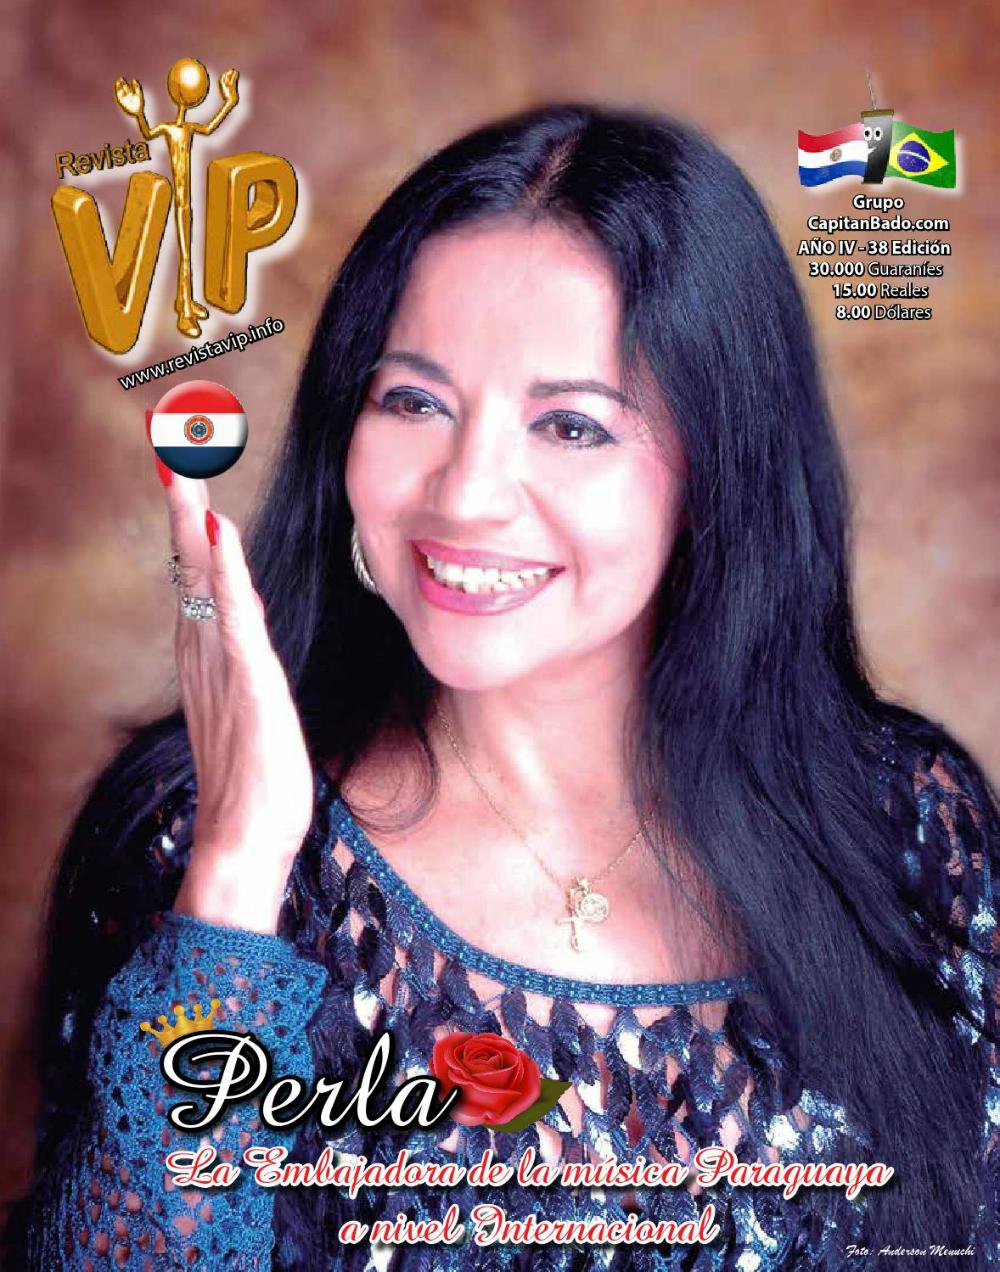 Vip 38 Paraguay